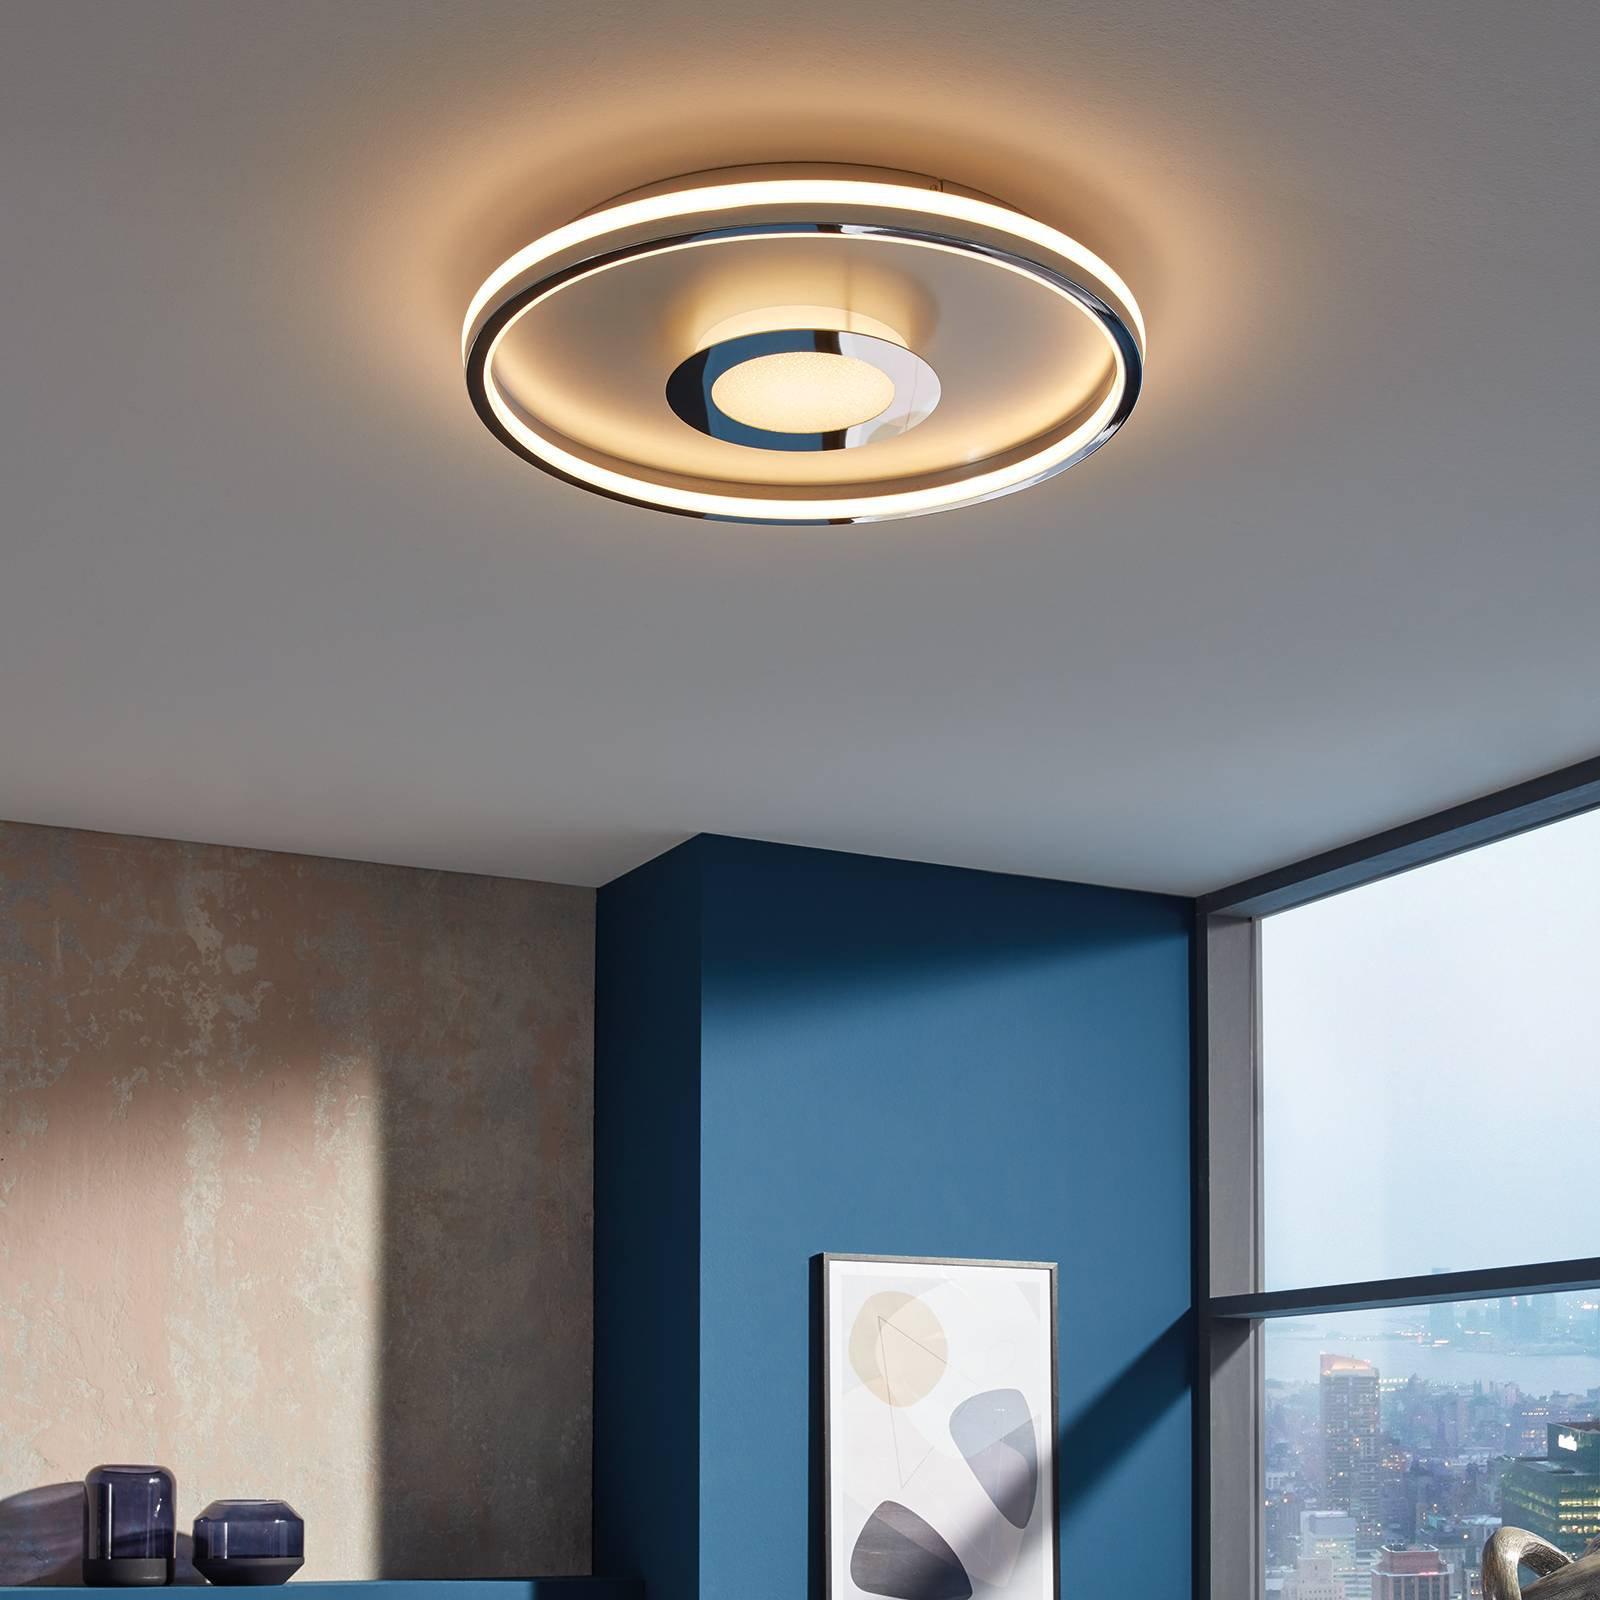 LED-taklampe Bug rund, krom, 81 cm